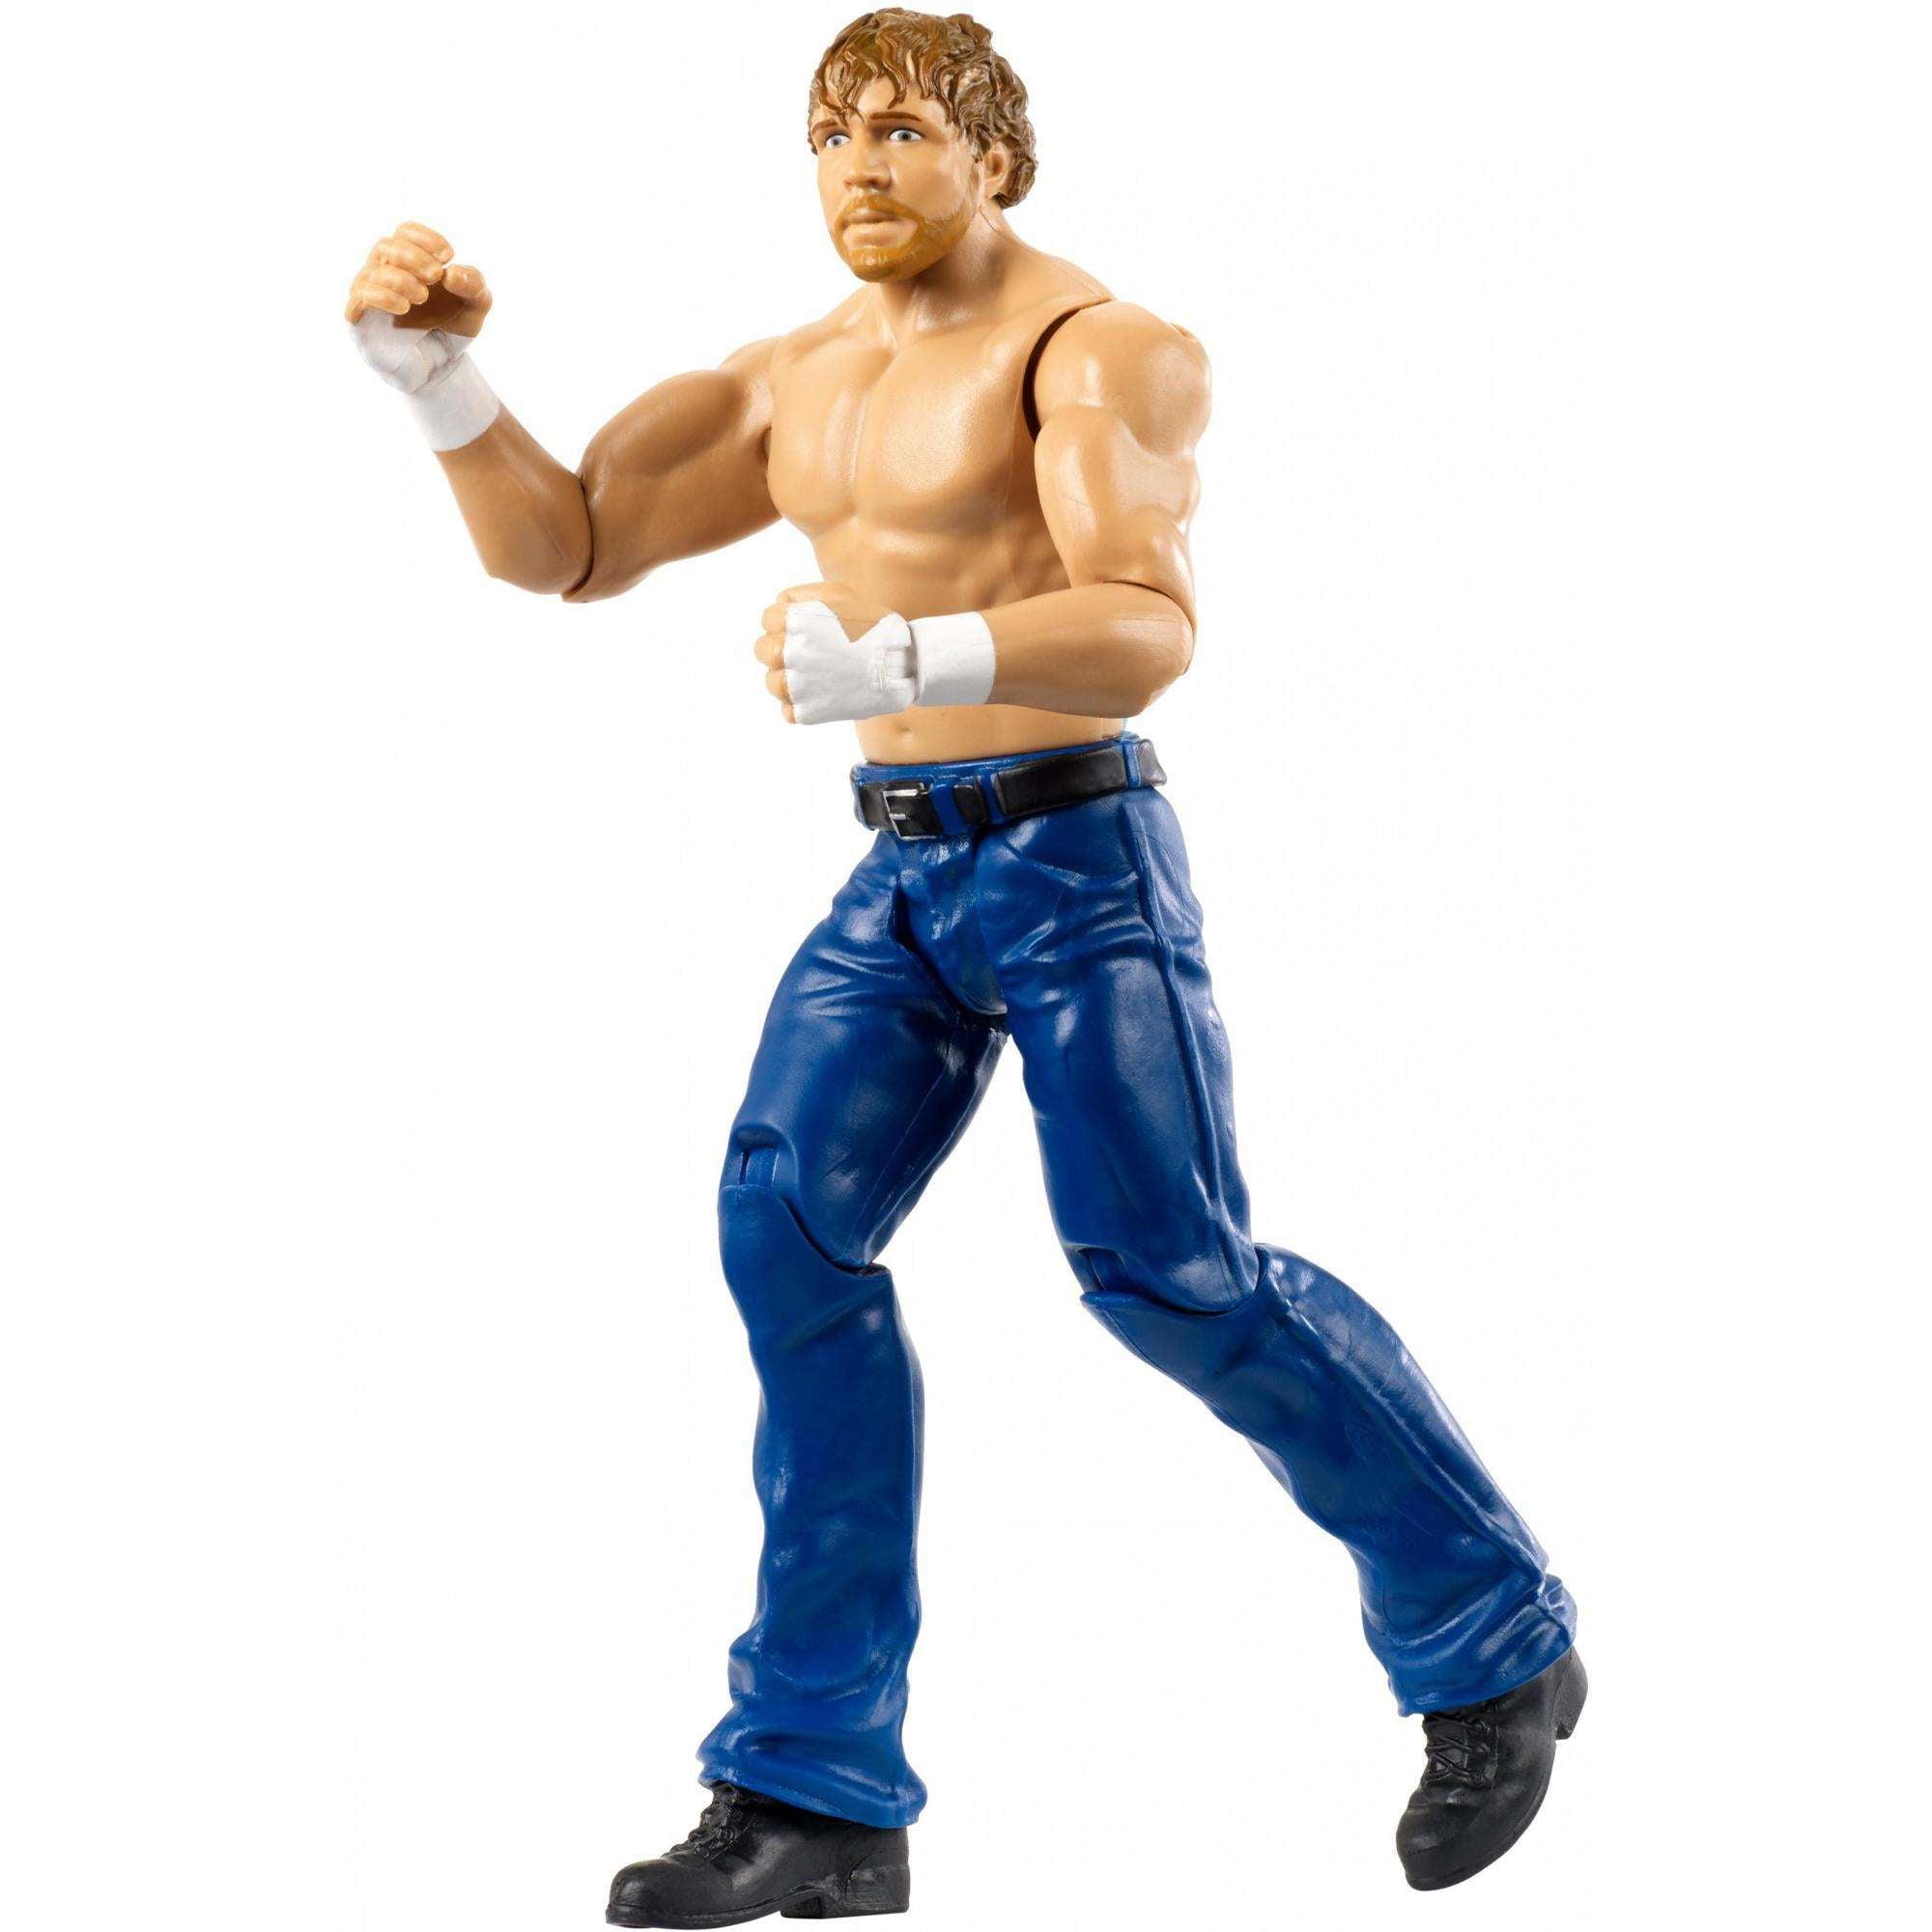 WWE Wrestlemania Dean Ambrose Action Figure